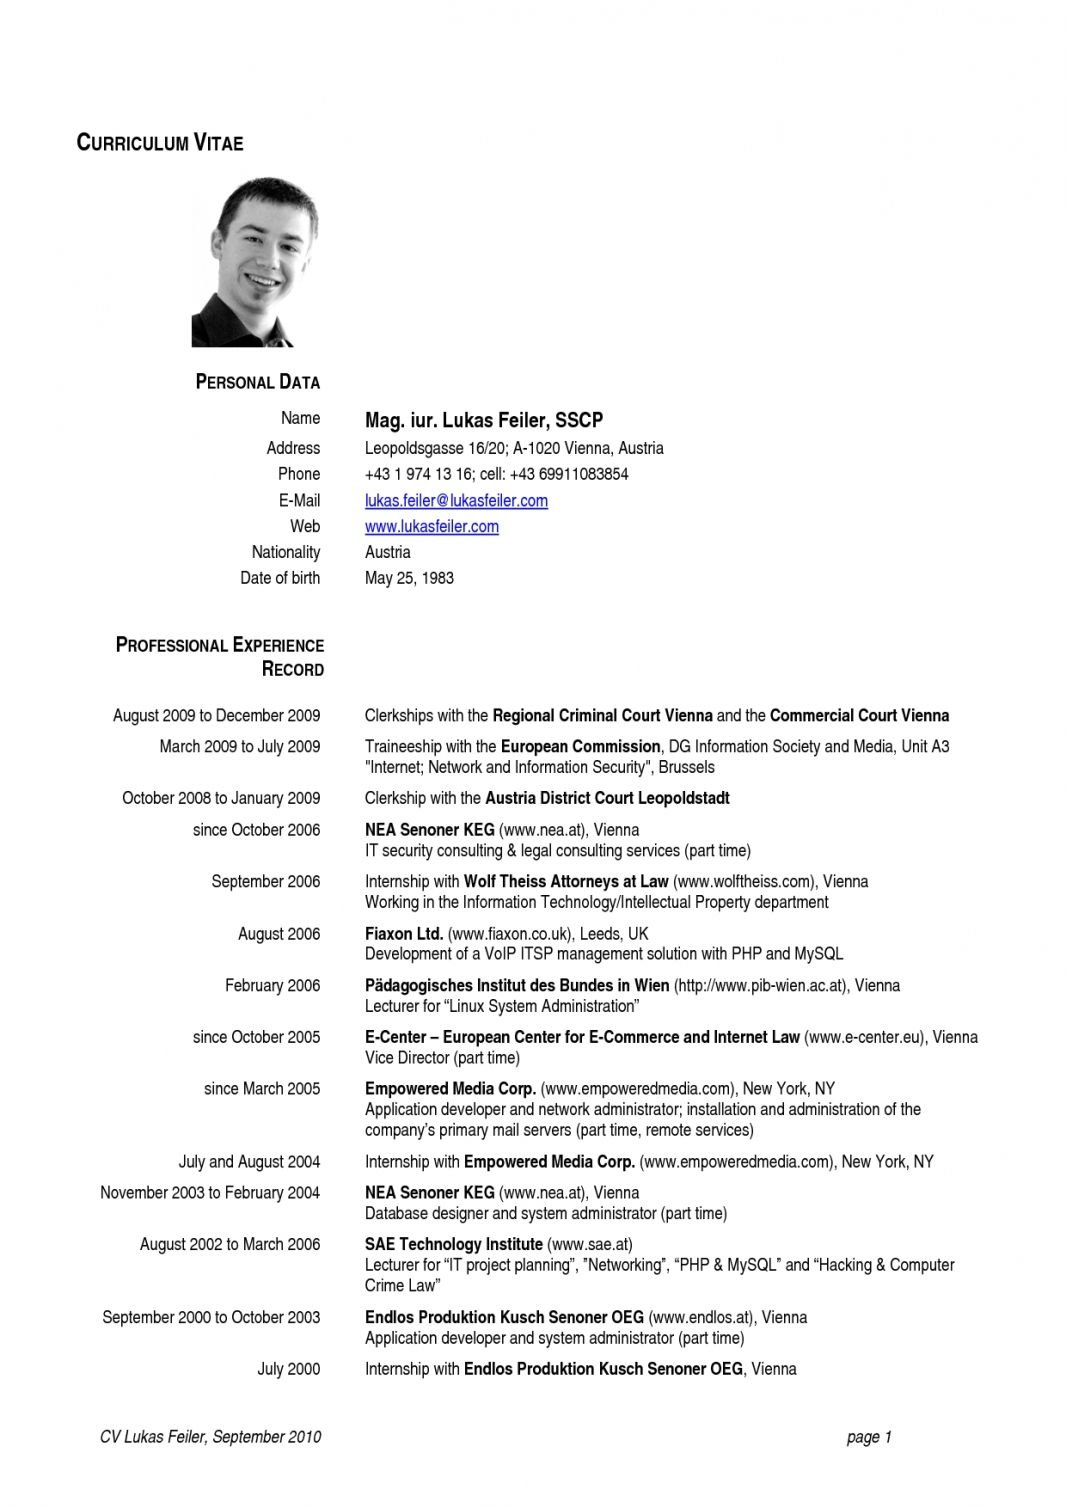 Cv Template Europe Curriculum vitae, Curriculum vitae